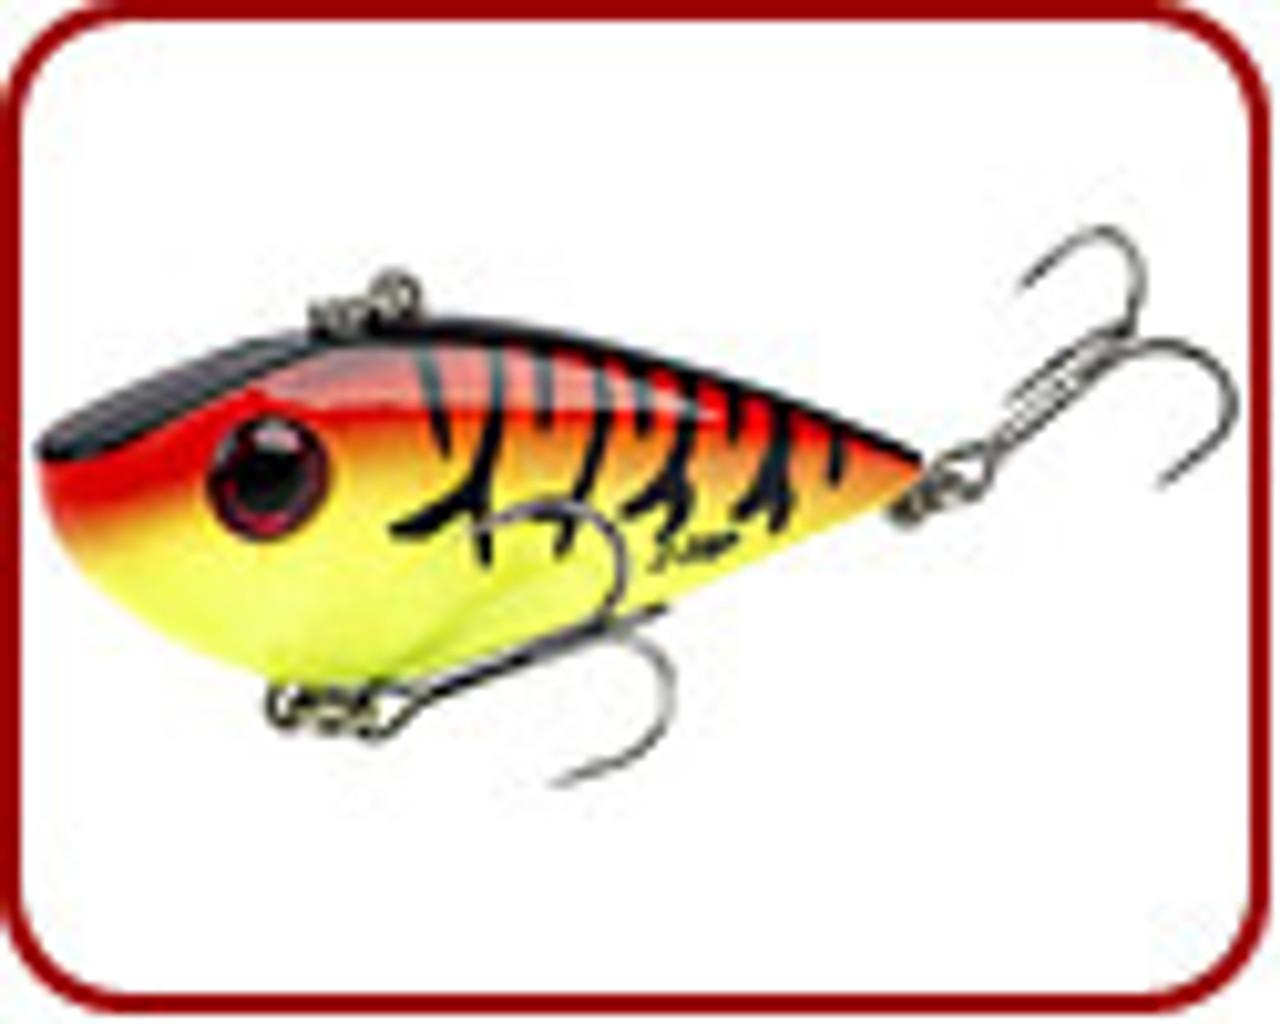 Pick Strike King Red Eye Shad Lipless Crankbait 3in 3//4oz